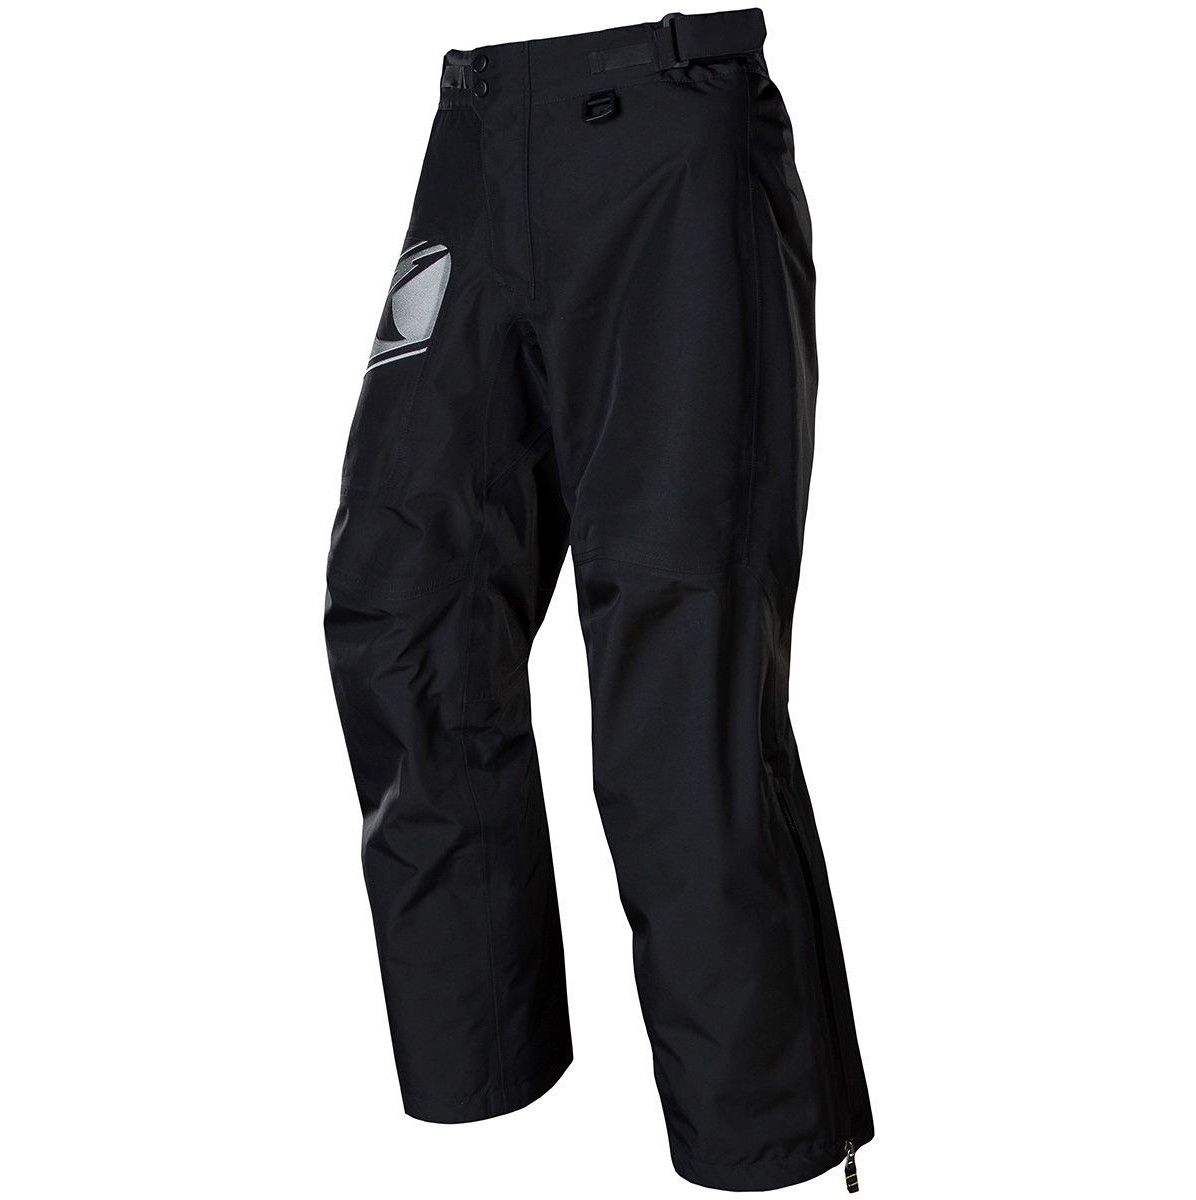 2014-klim-impulse-pants-mcss.jpg